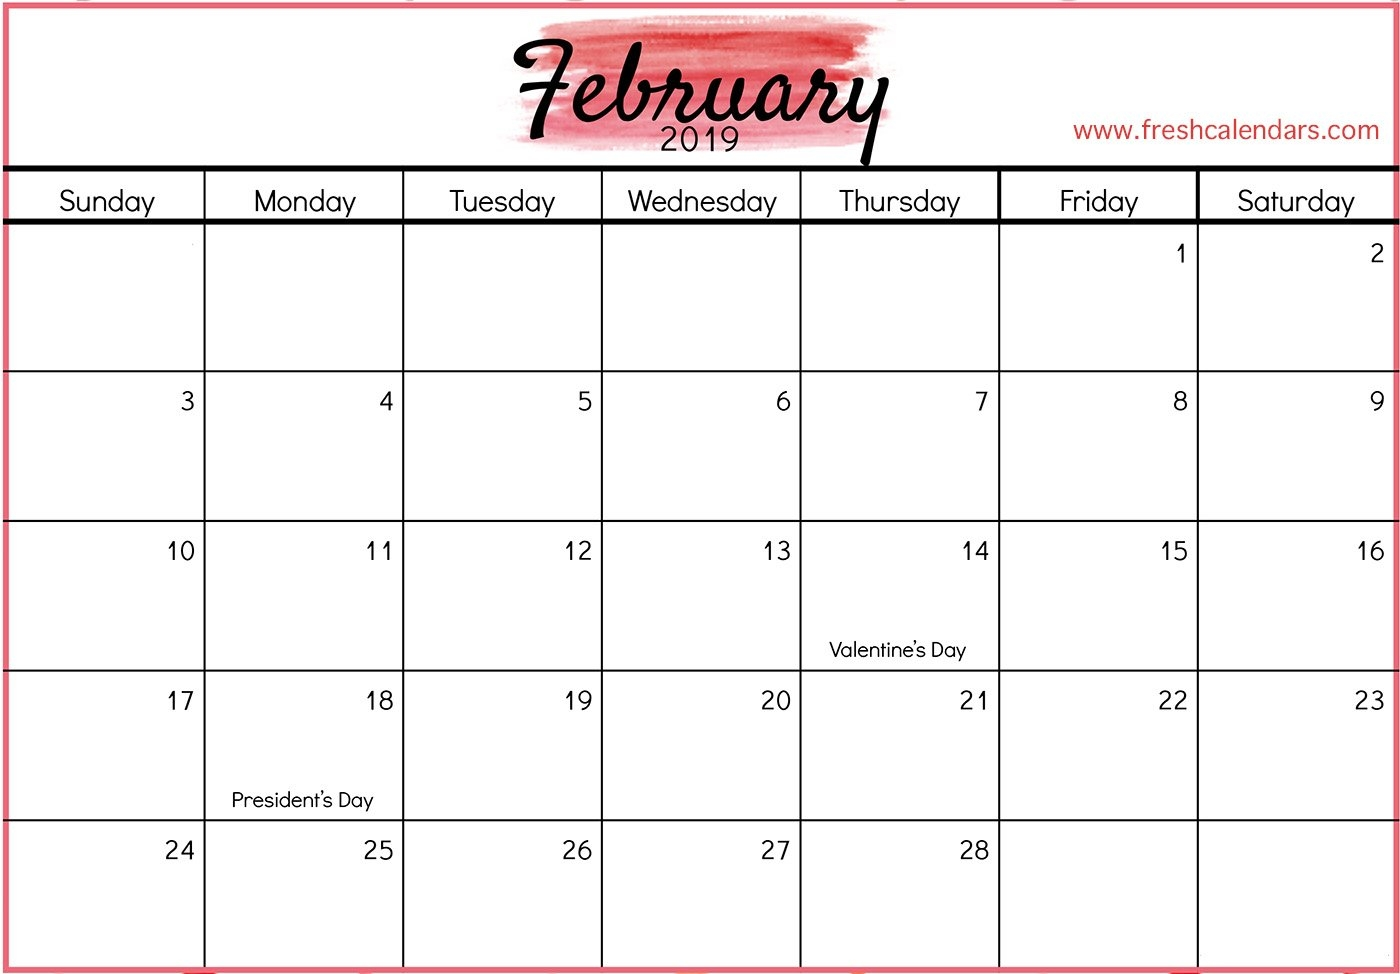 February 2019 Printable Calendars – Fresh Calendars Feb 9 2019 Calendar